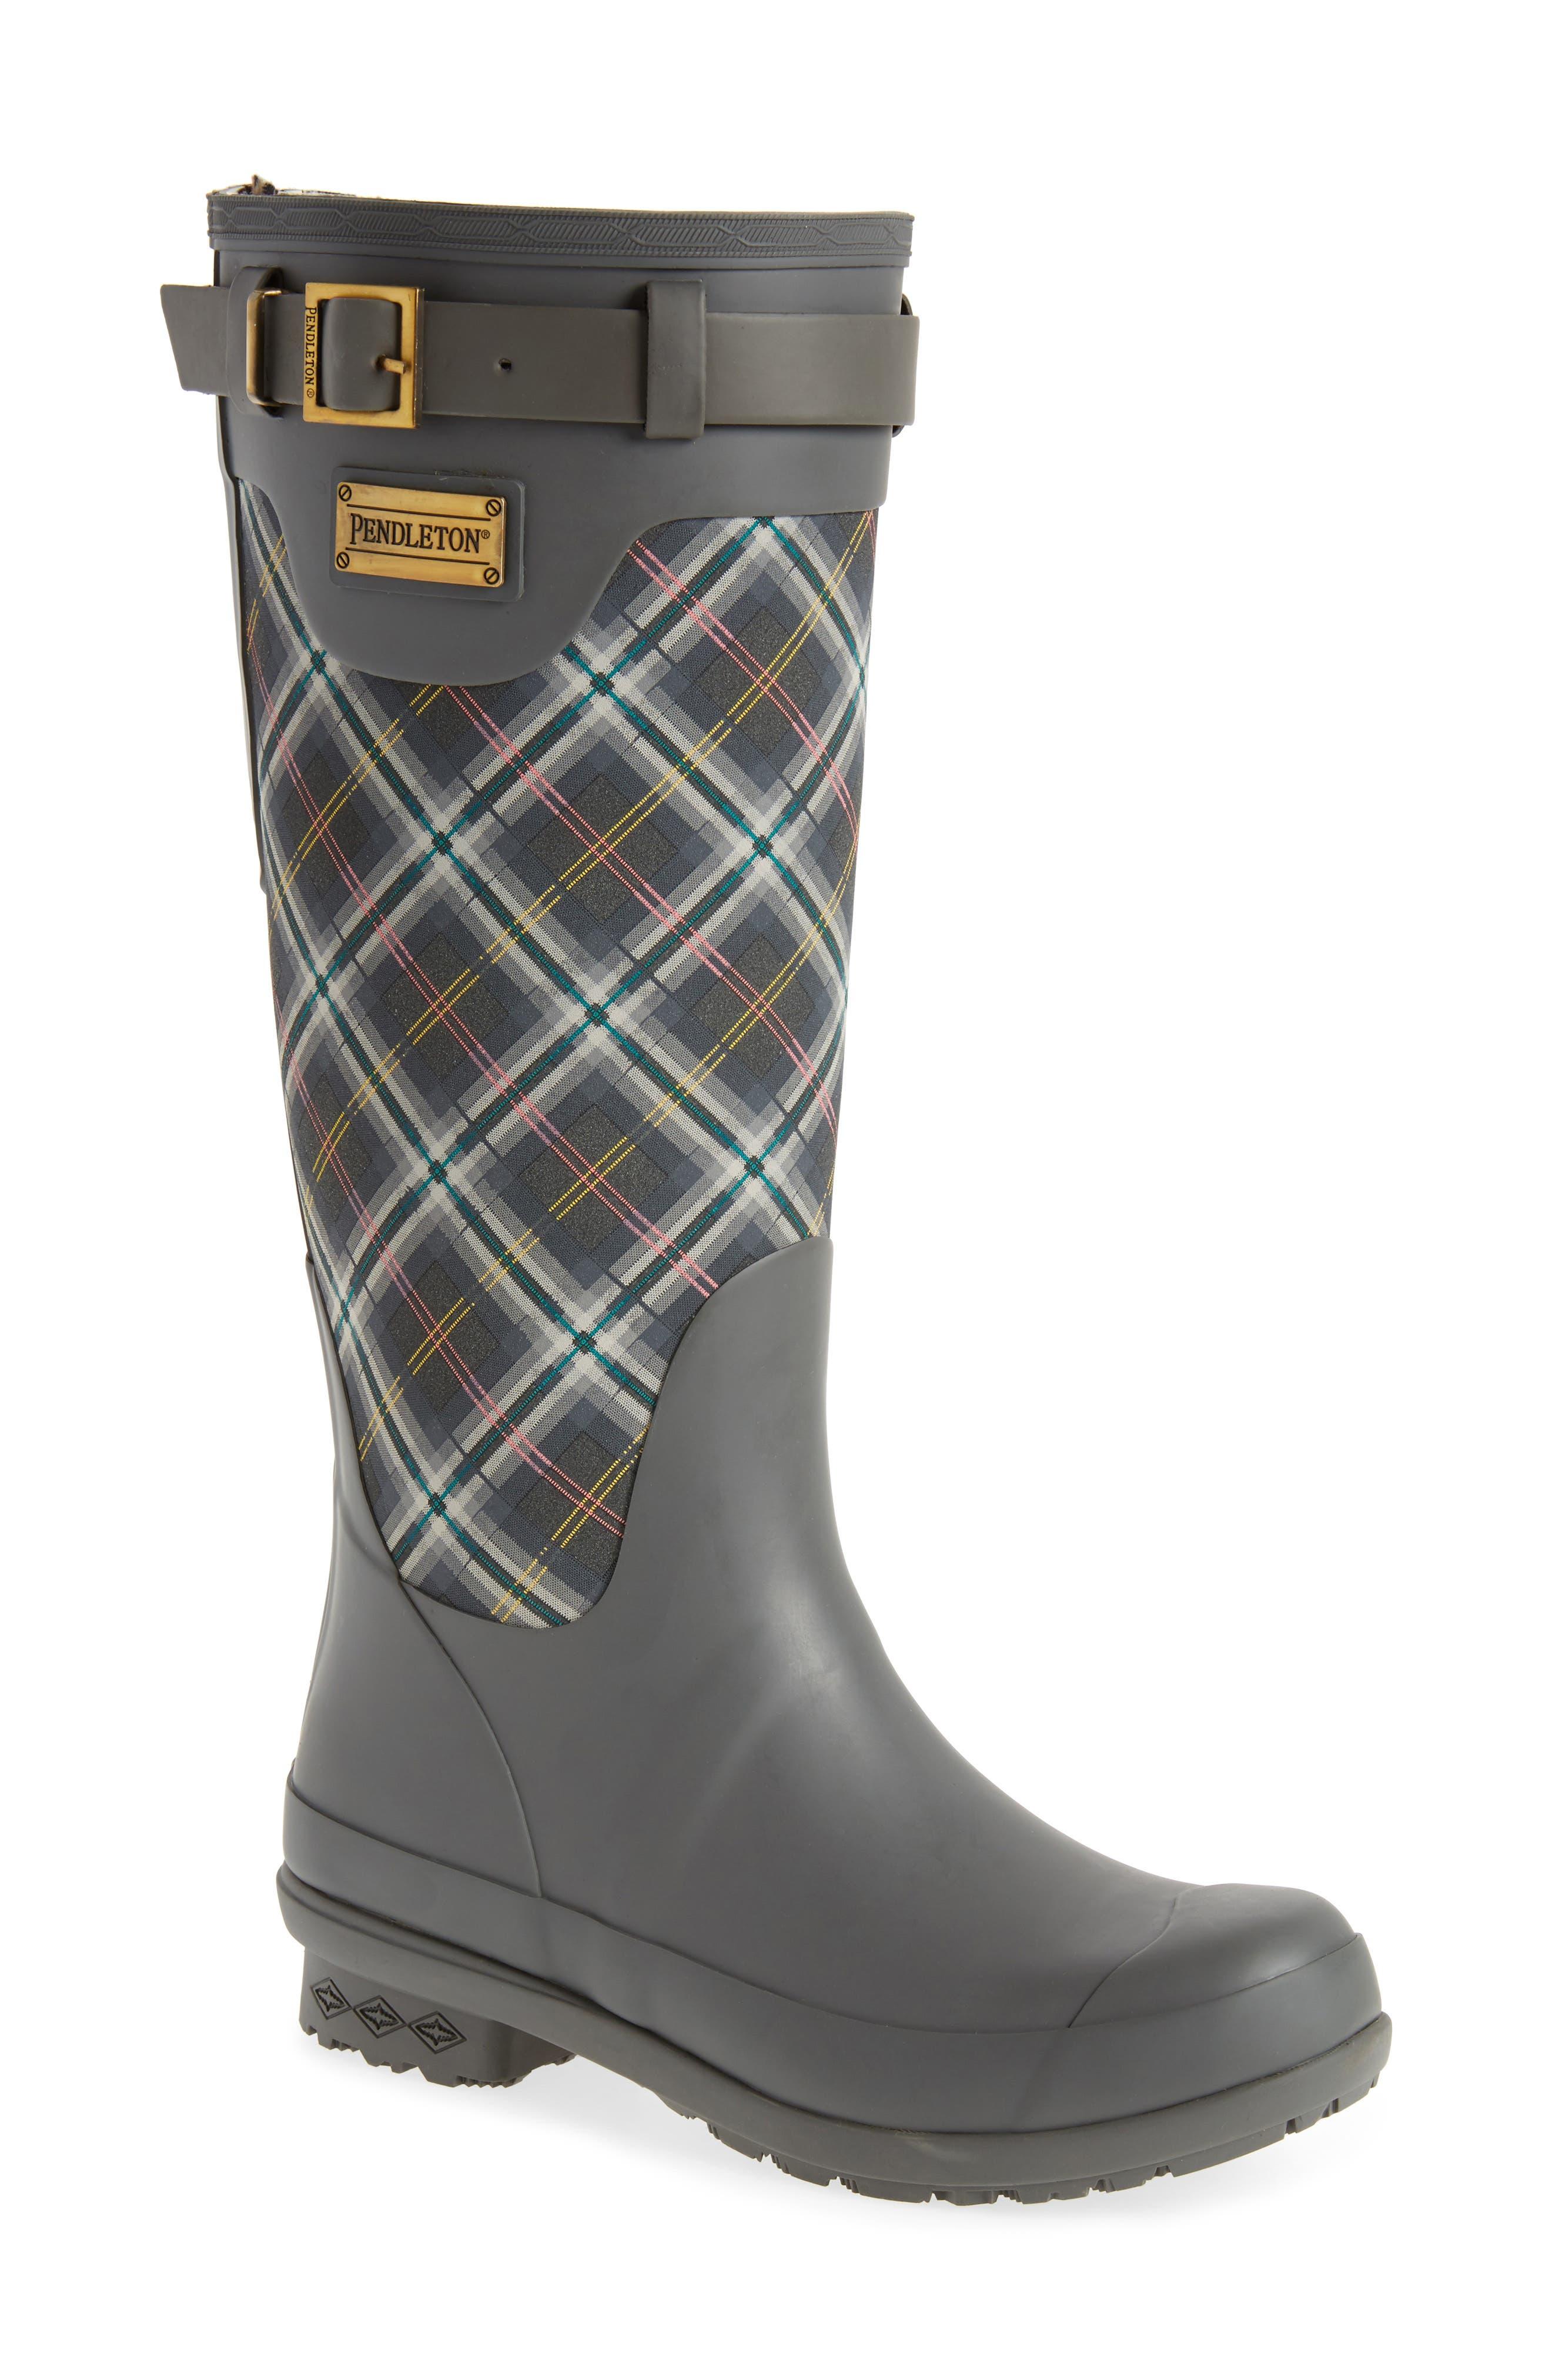 Pendleton Oxford Rain Boot,                         Main,                         color, GRAY